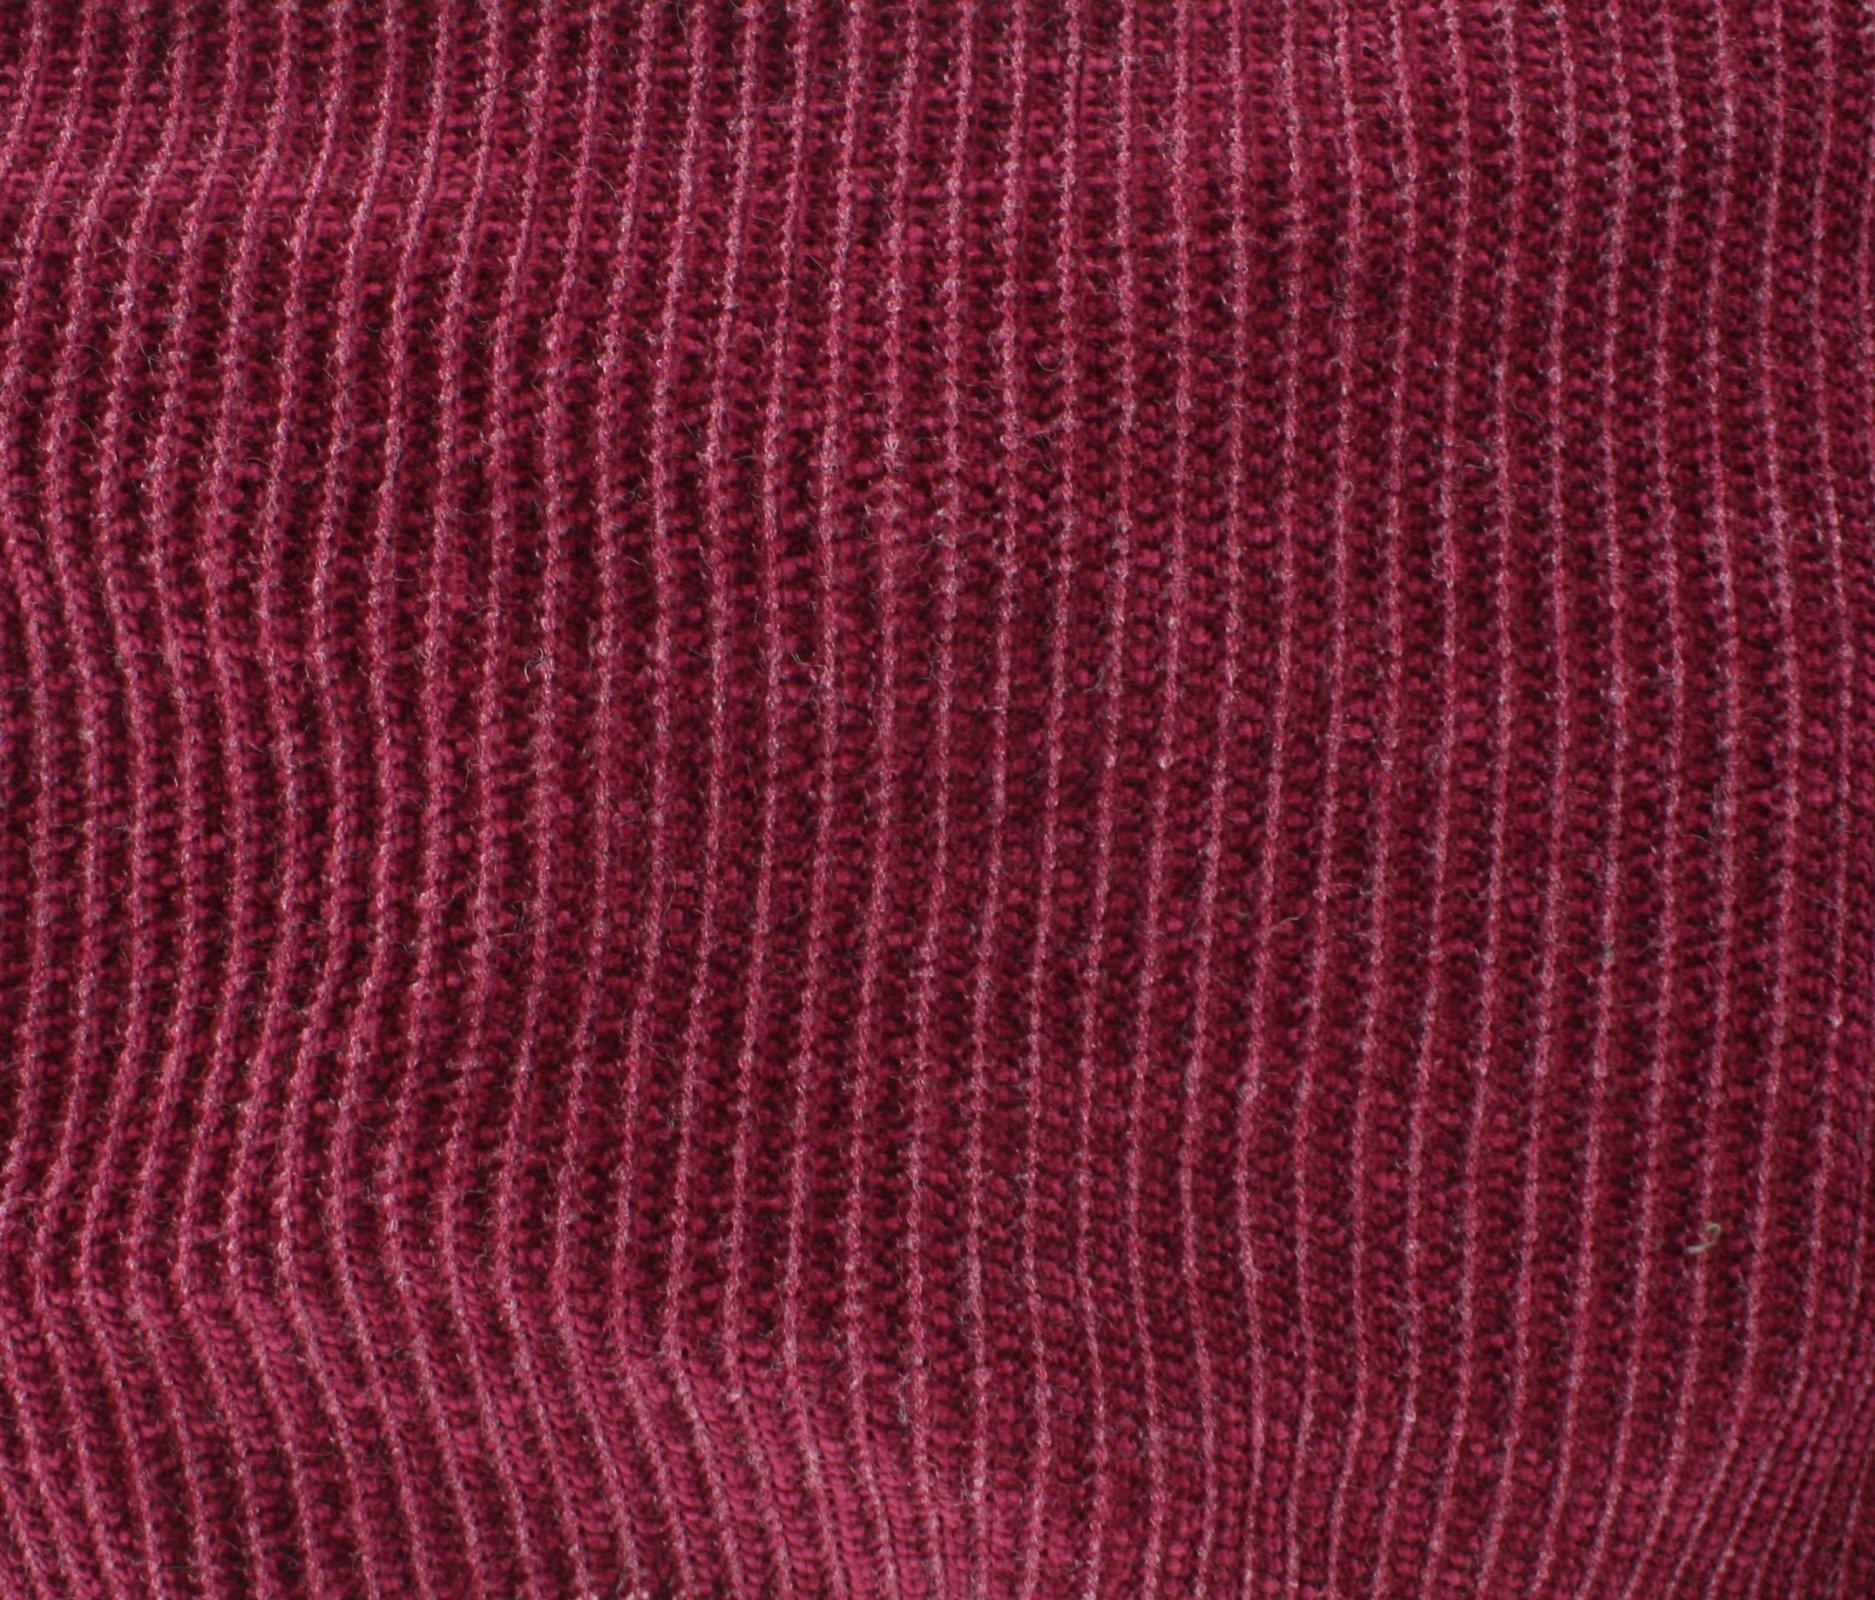 Chenille Knit - Wine